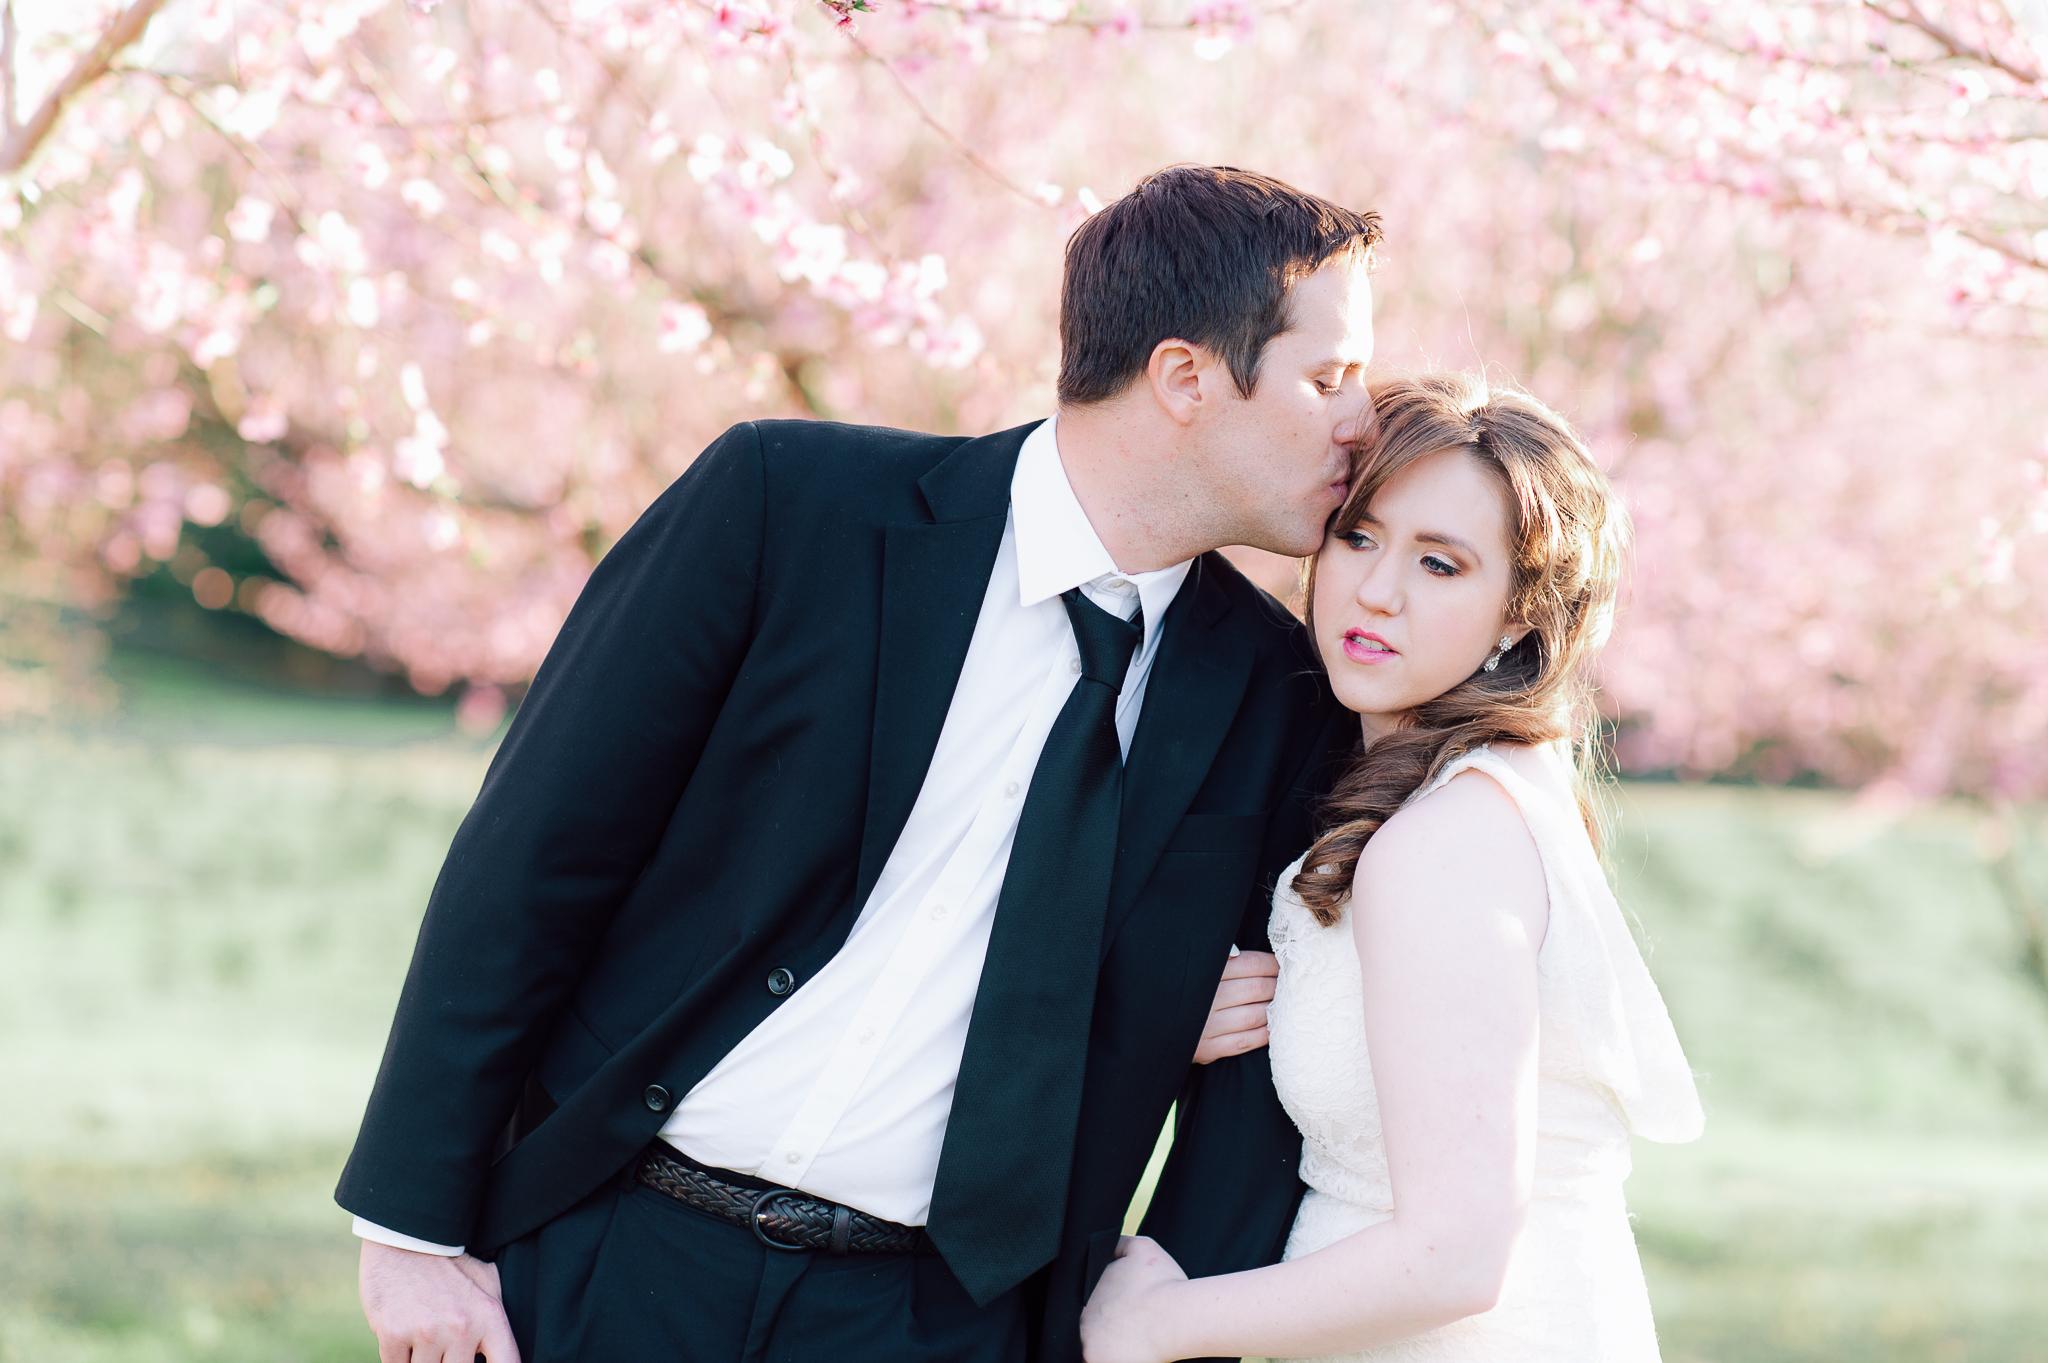 springwedding_cherryblossoms_virginiaphotographer_youseephotography_styledshoot (556).jpg